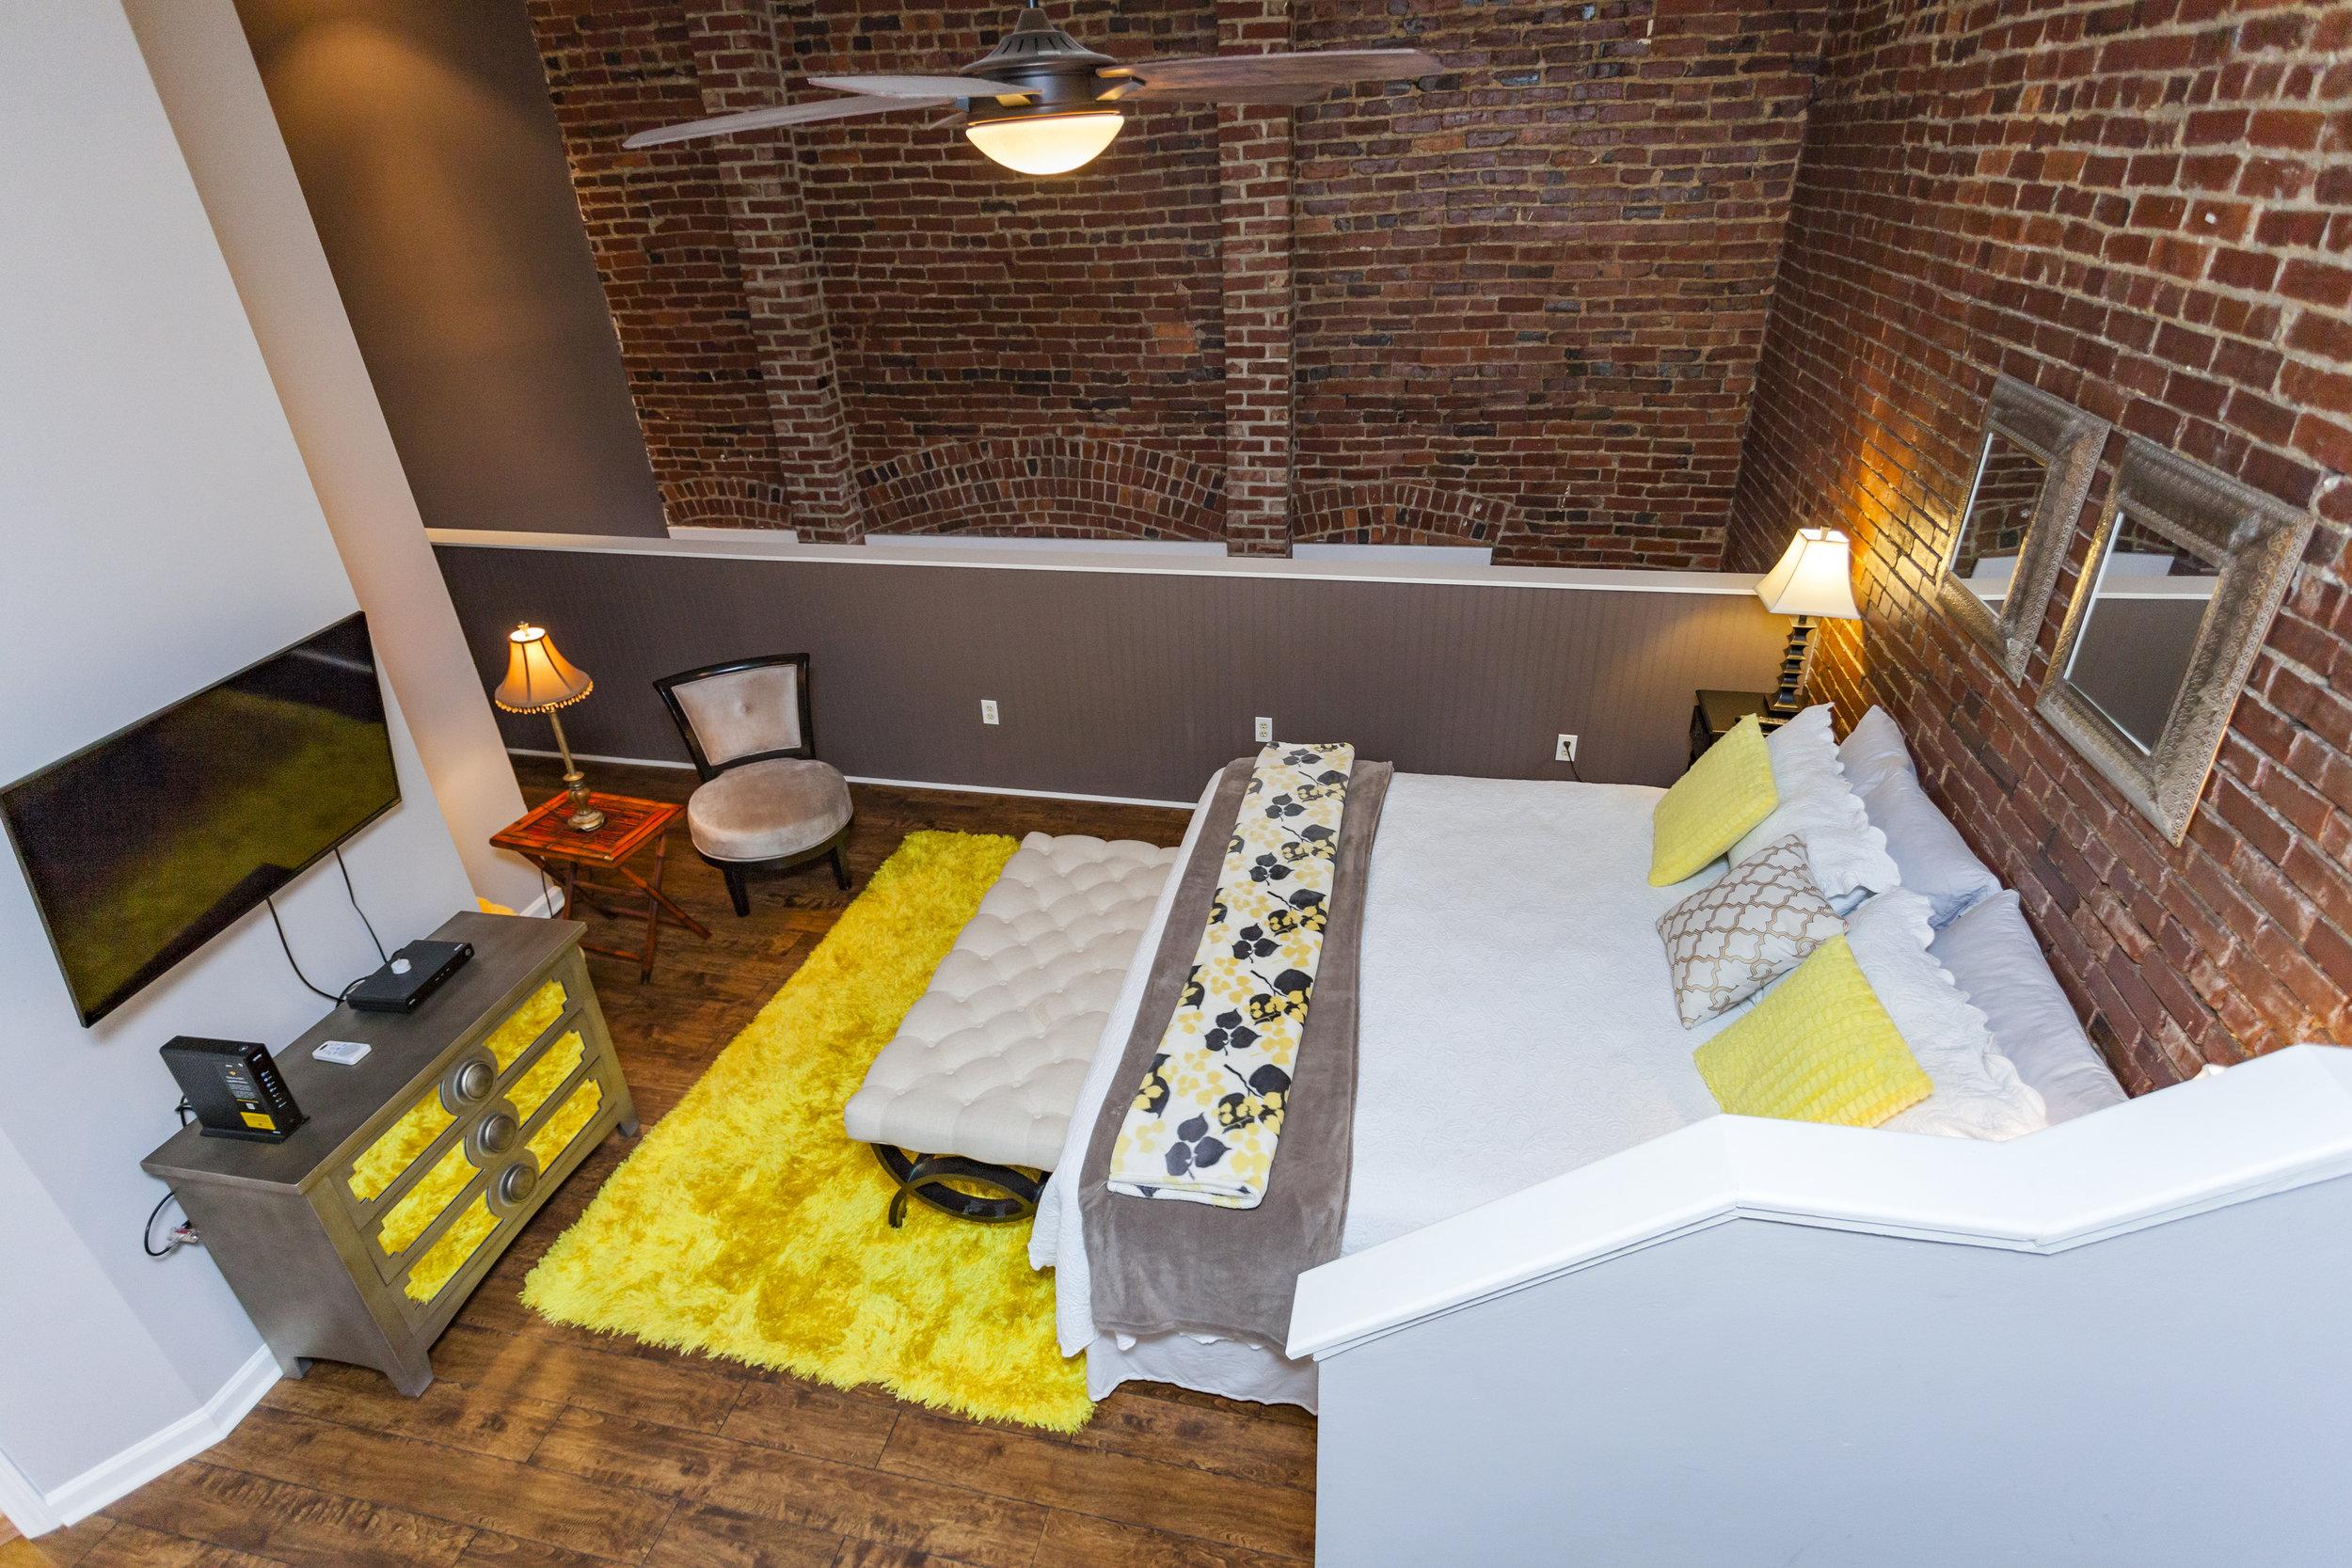 Luxury accommodations in Nashville